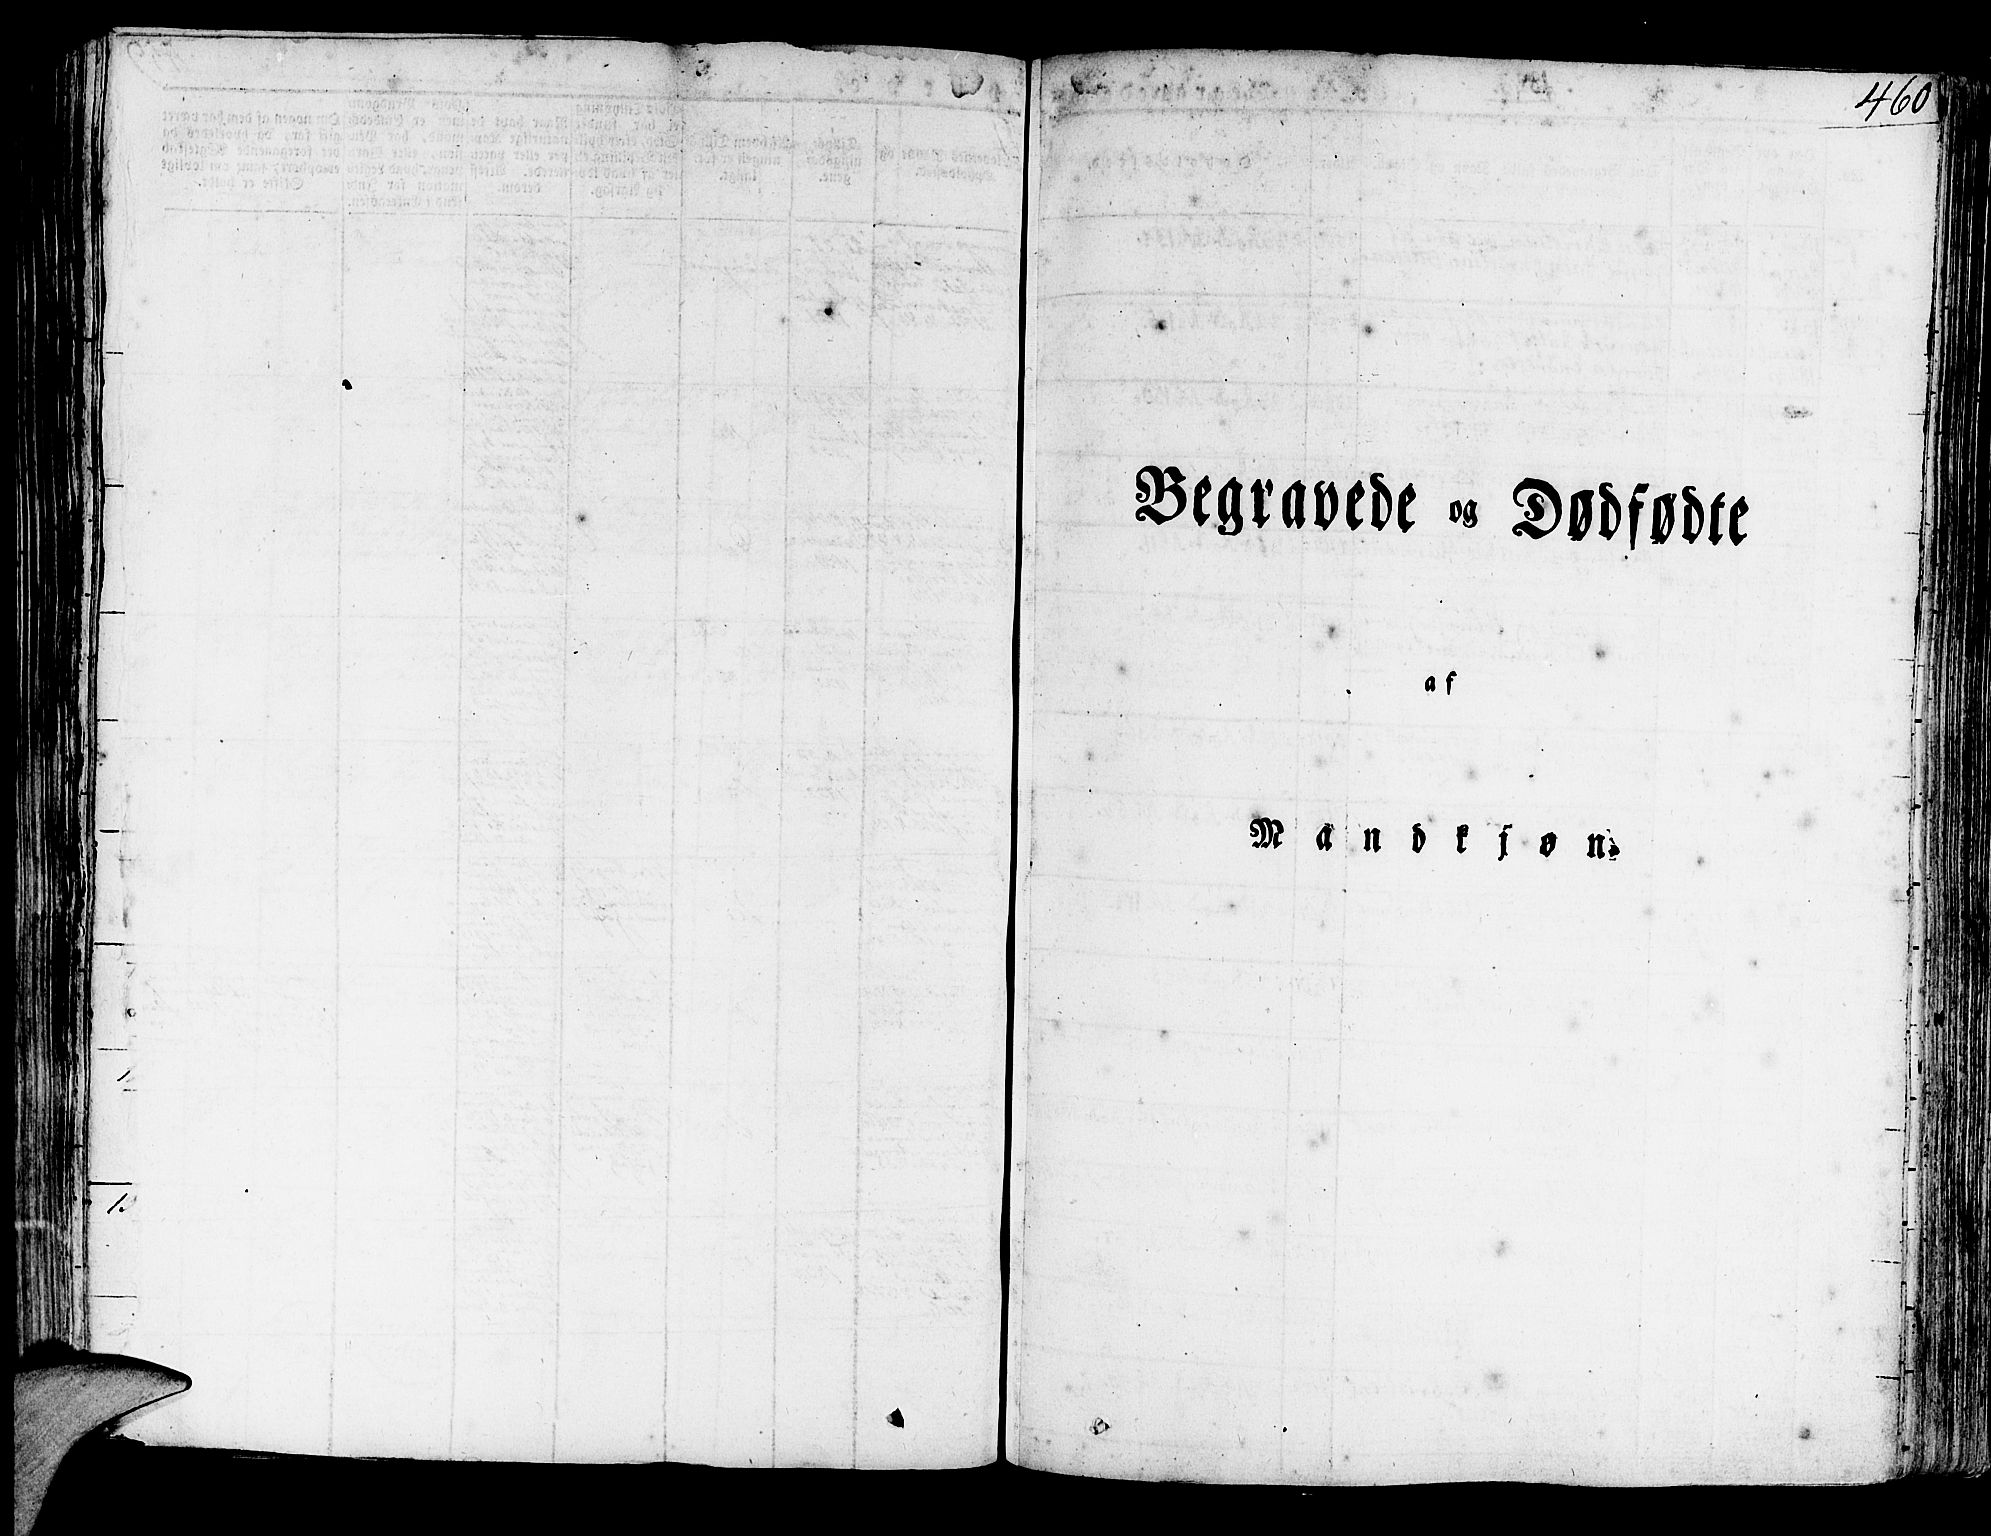 SAB, Korskirken Sokneprestembete, H/Haa/L0014: Ministerialbok nr. A 14, 1823-1835, s. 460